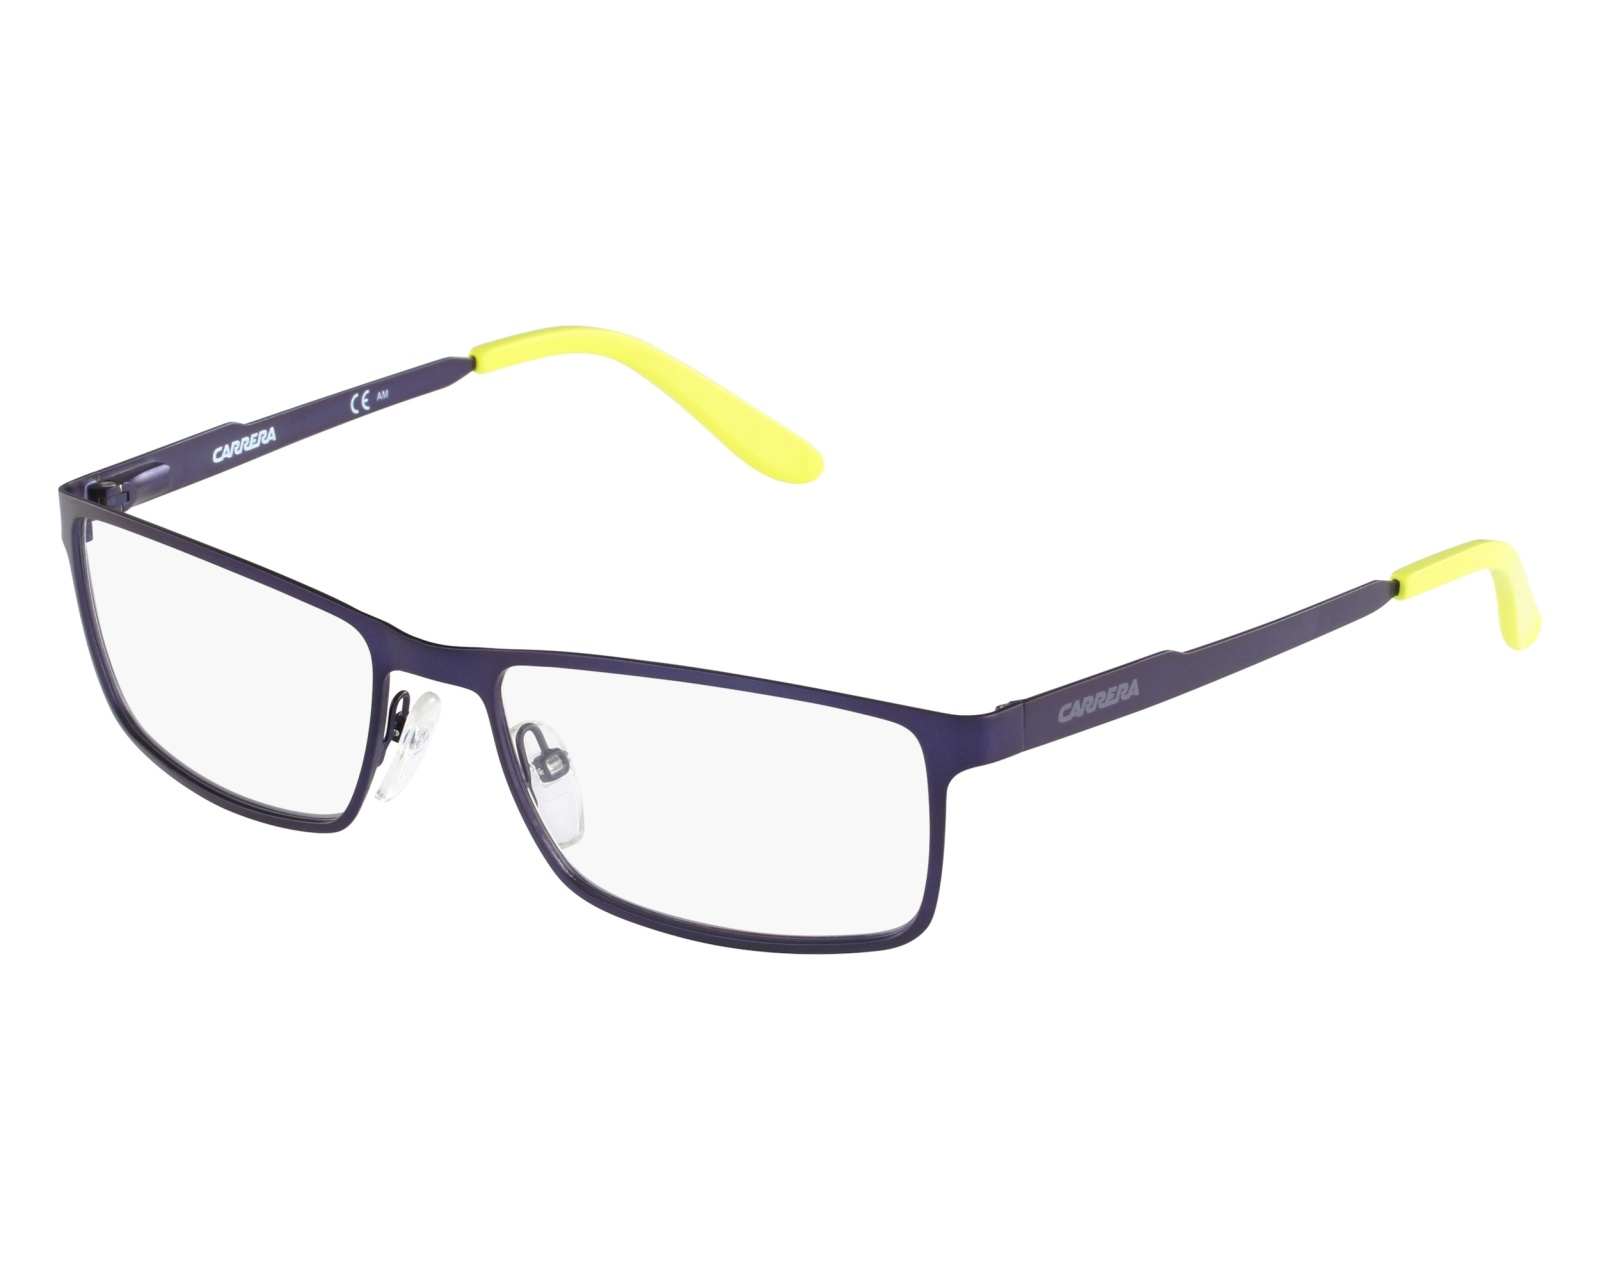 41c5713c36 eyeglasses Carrera CA-6630 5R1 54-17 Blue Green front view